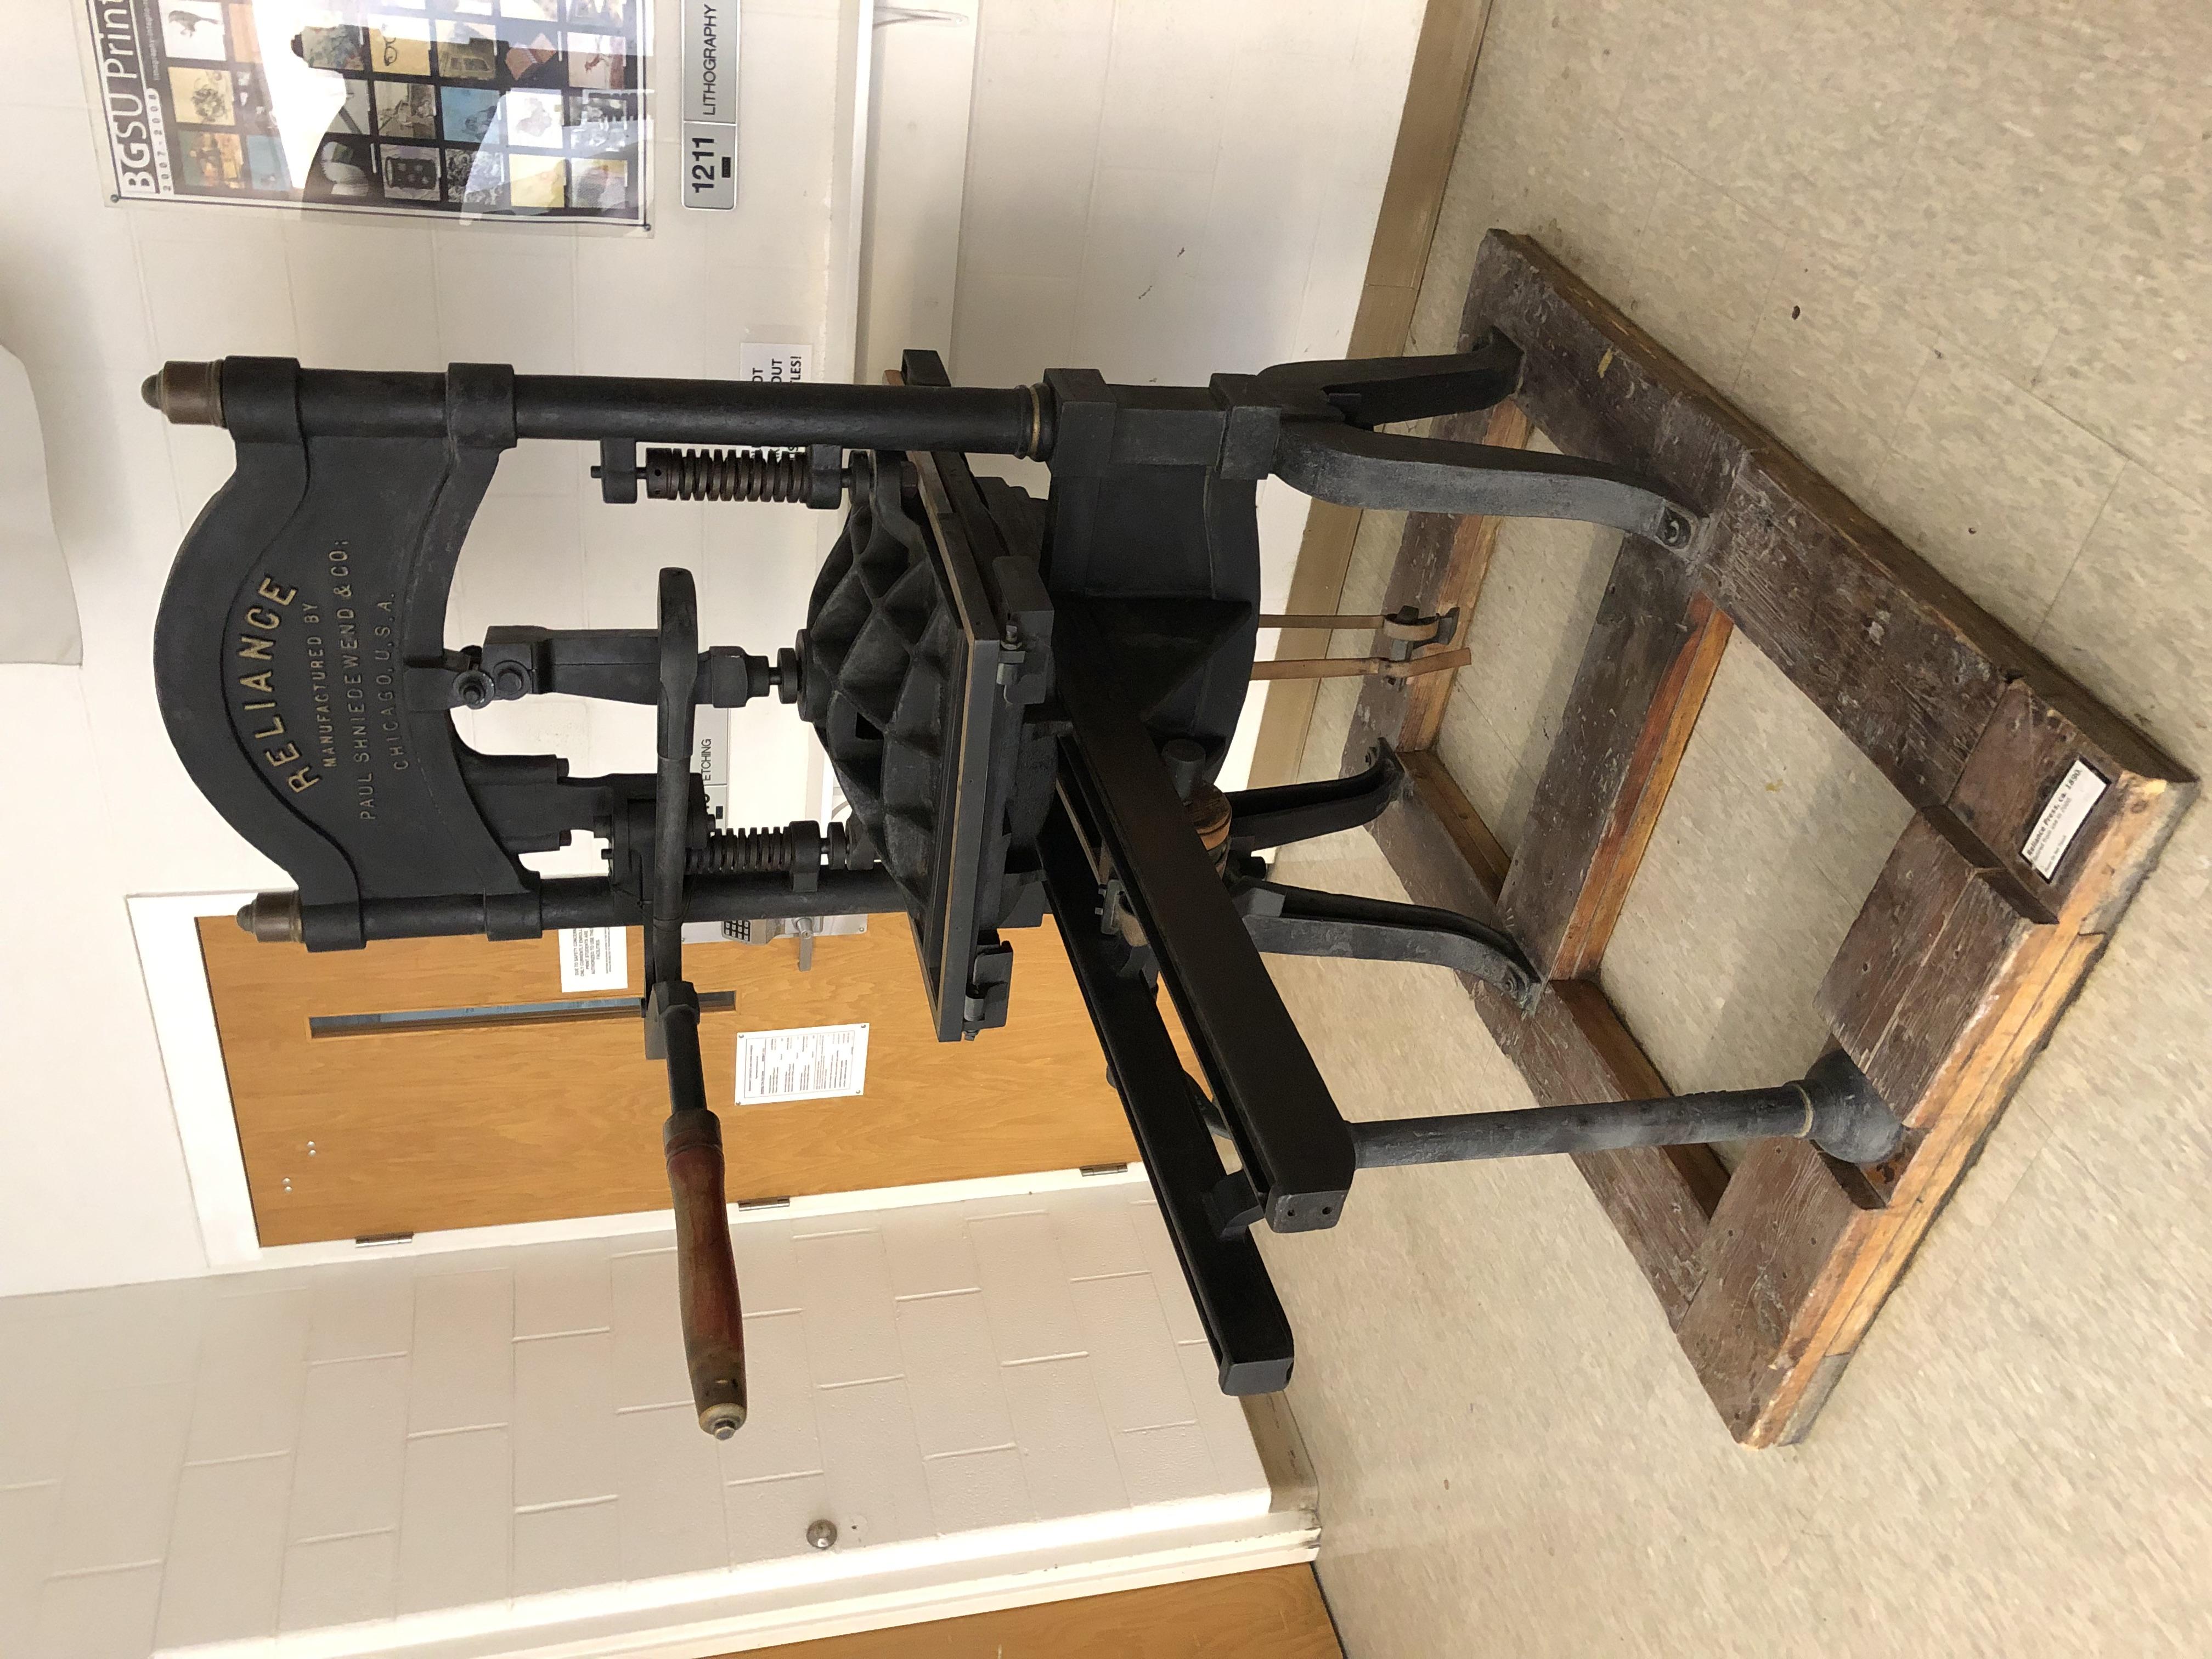 Printing press - Wikiwand